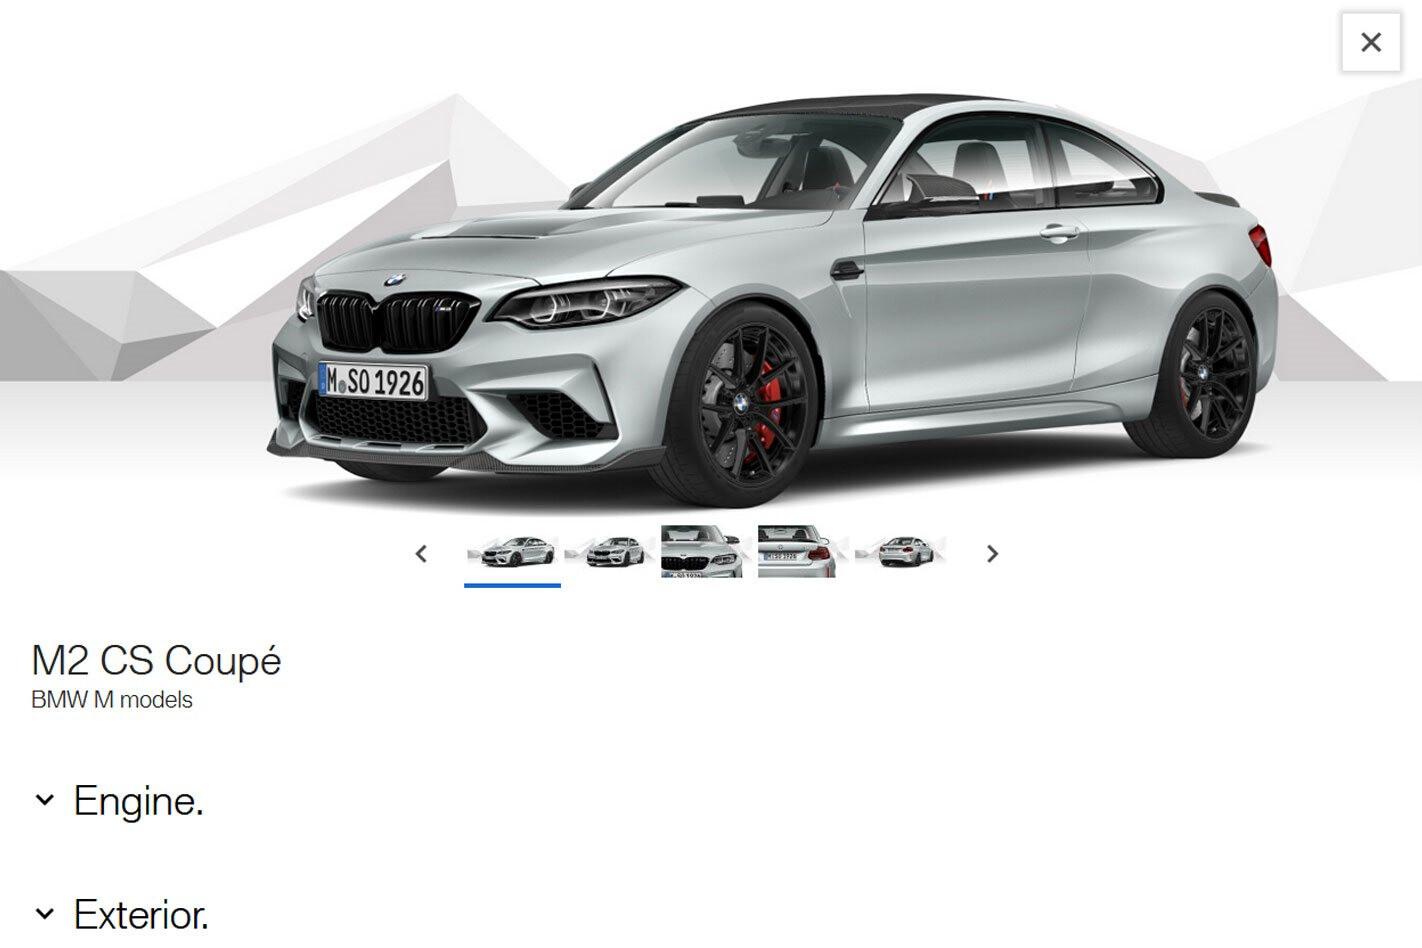 2020 BMW M 2 CS Configurator Whichcar 1 Jpg